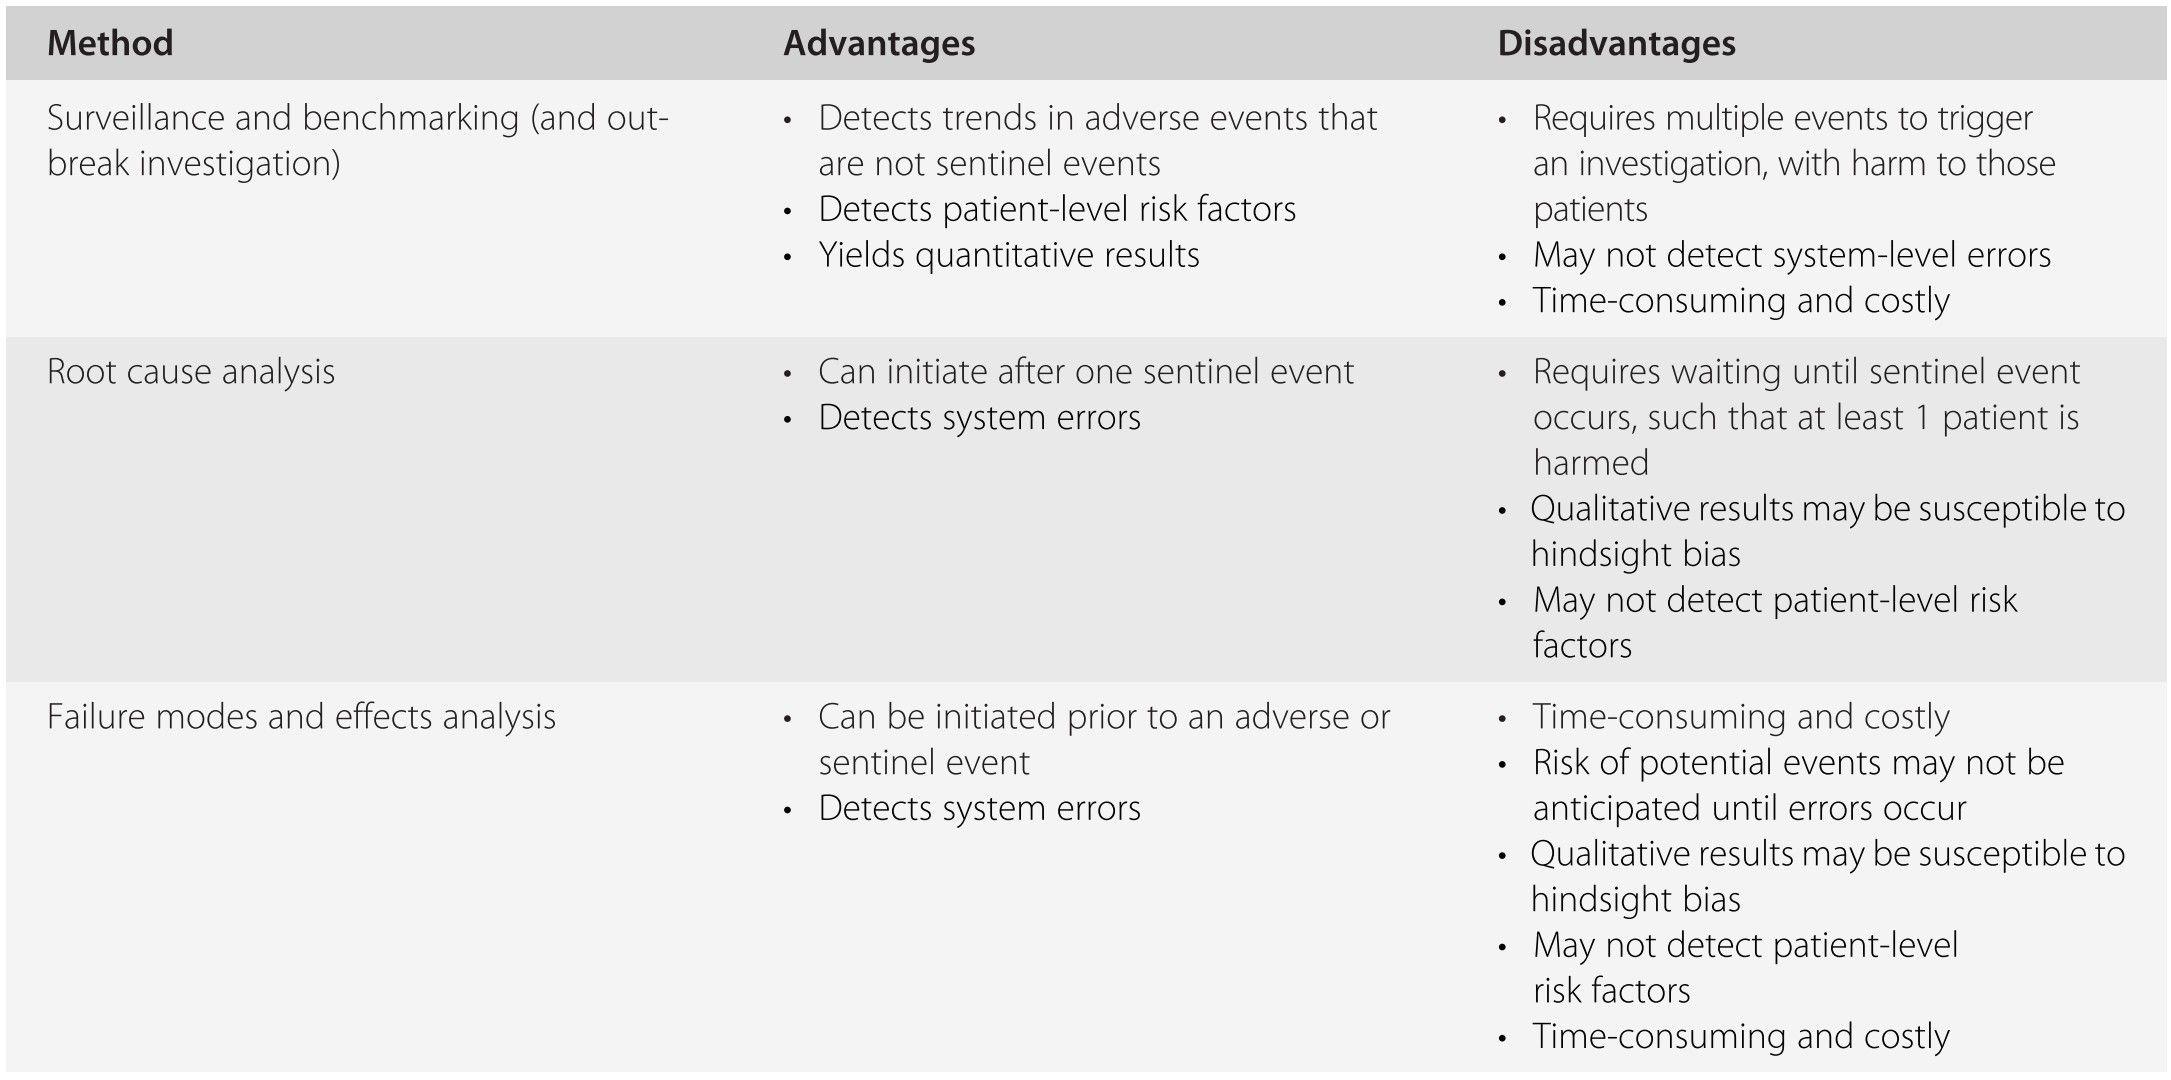 Limiting Factors Worksheet Answers - worksheet